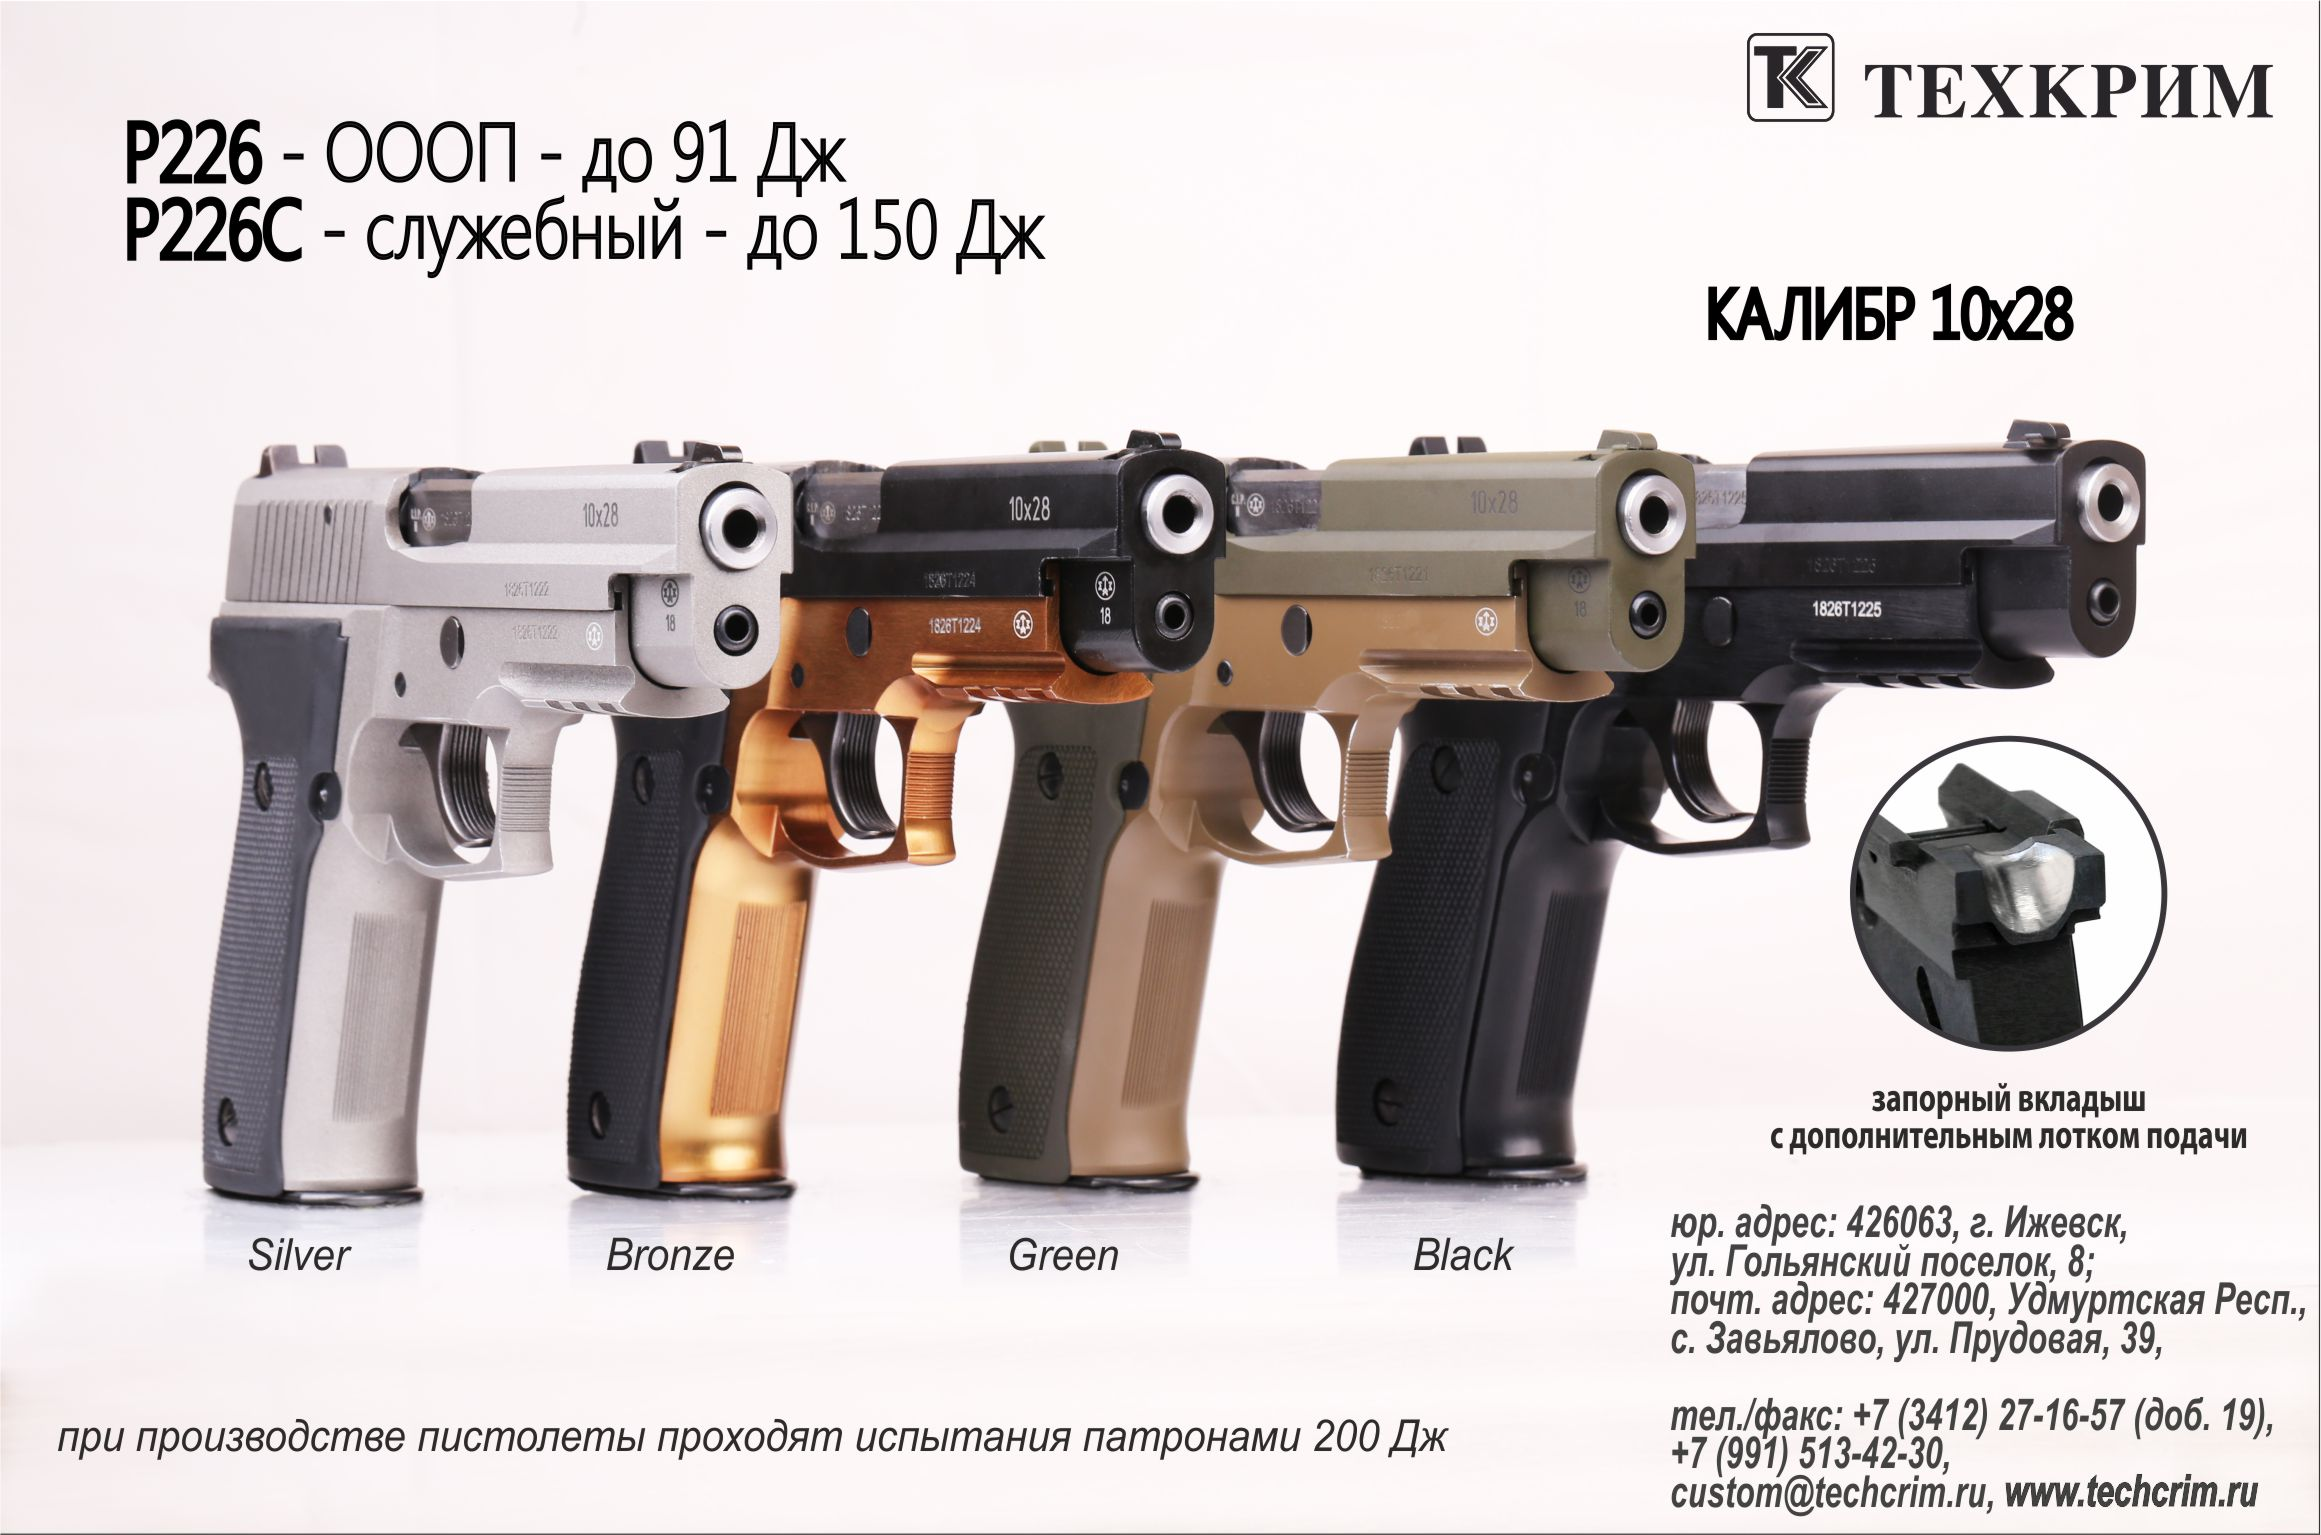 патрон 10 28